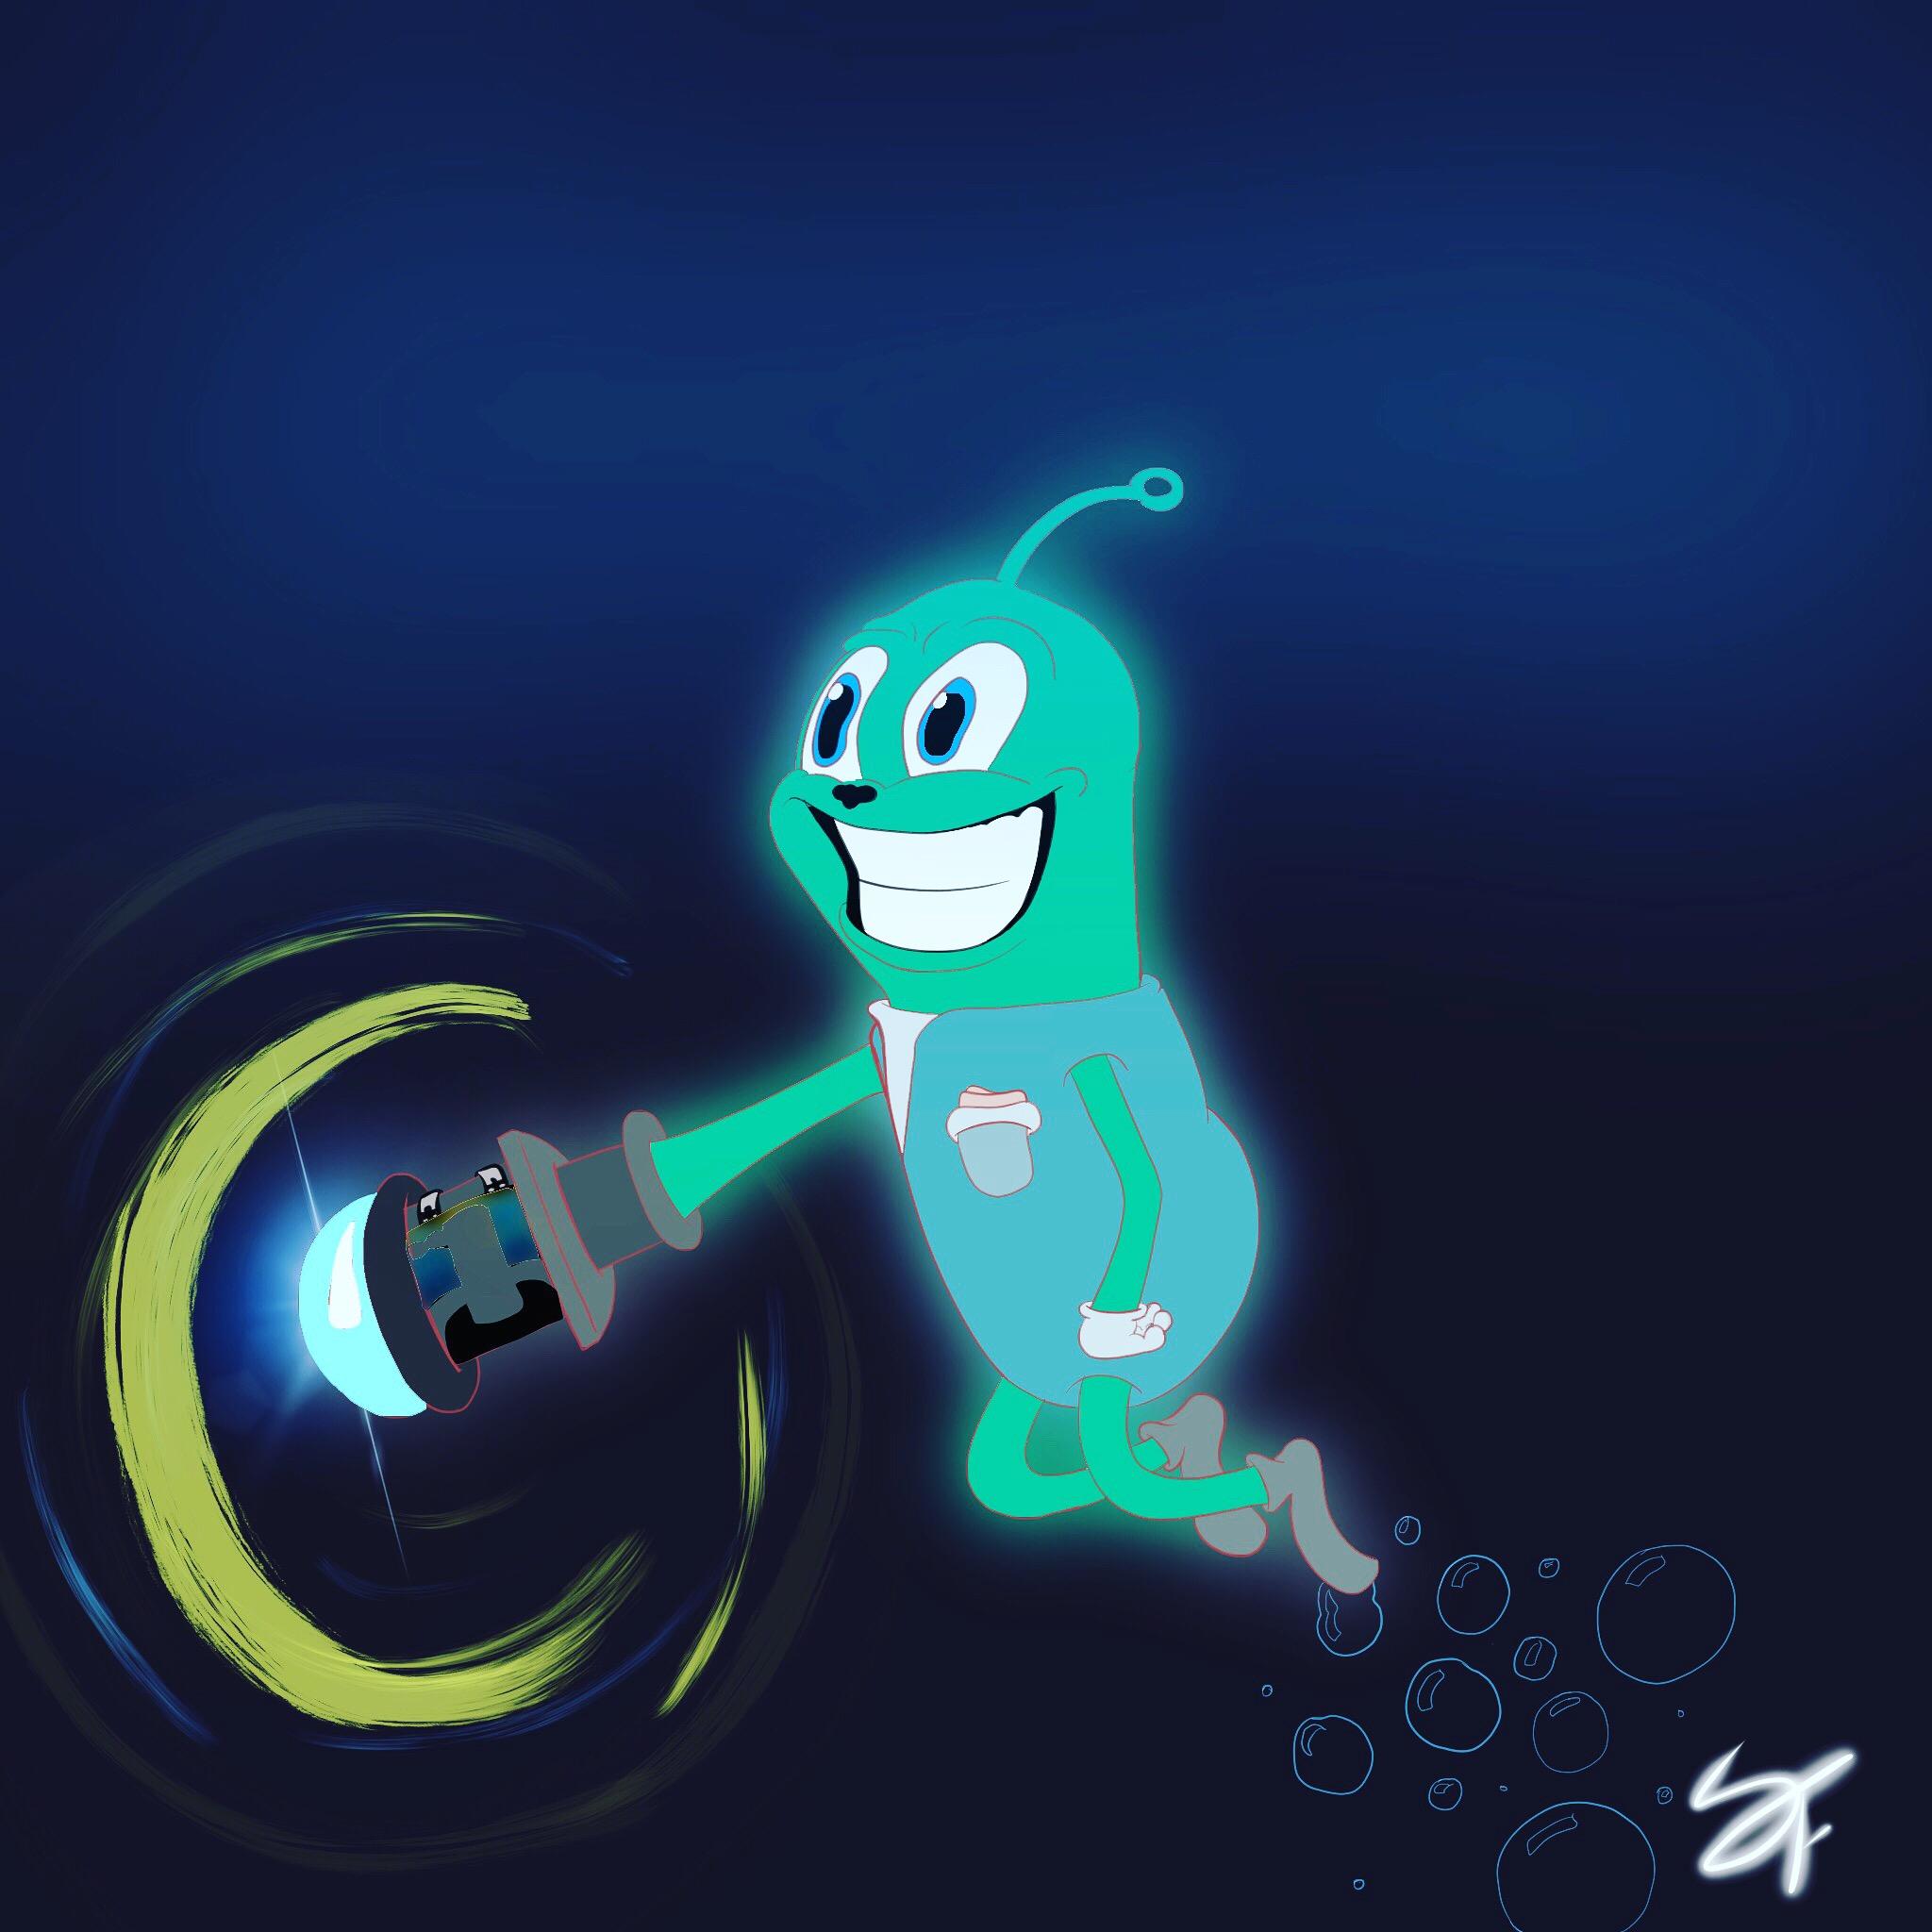 cartoon alien dude!